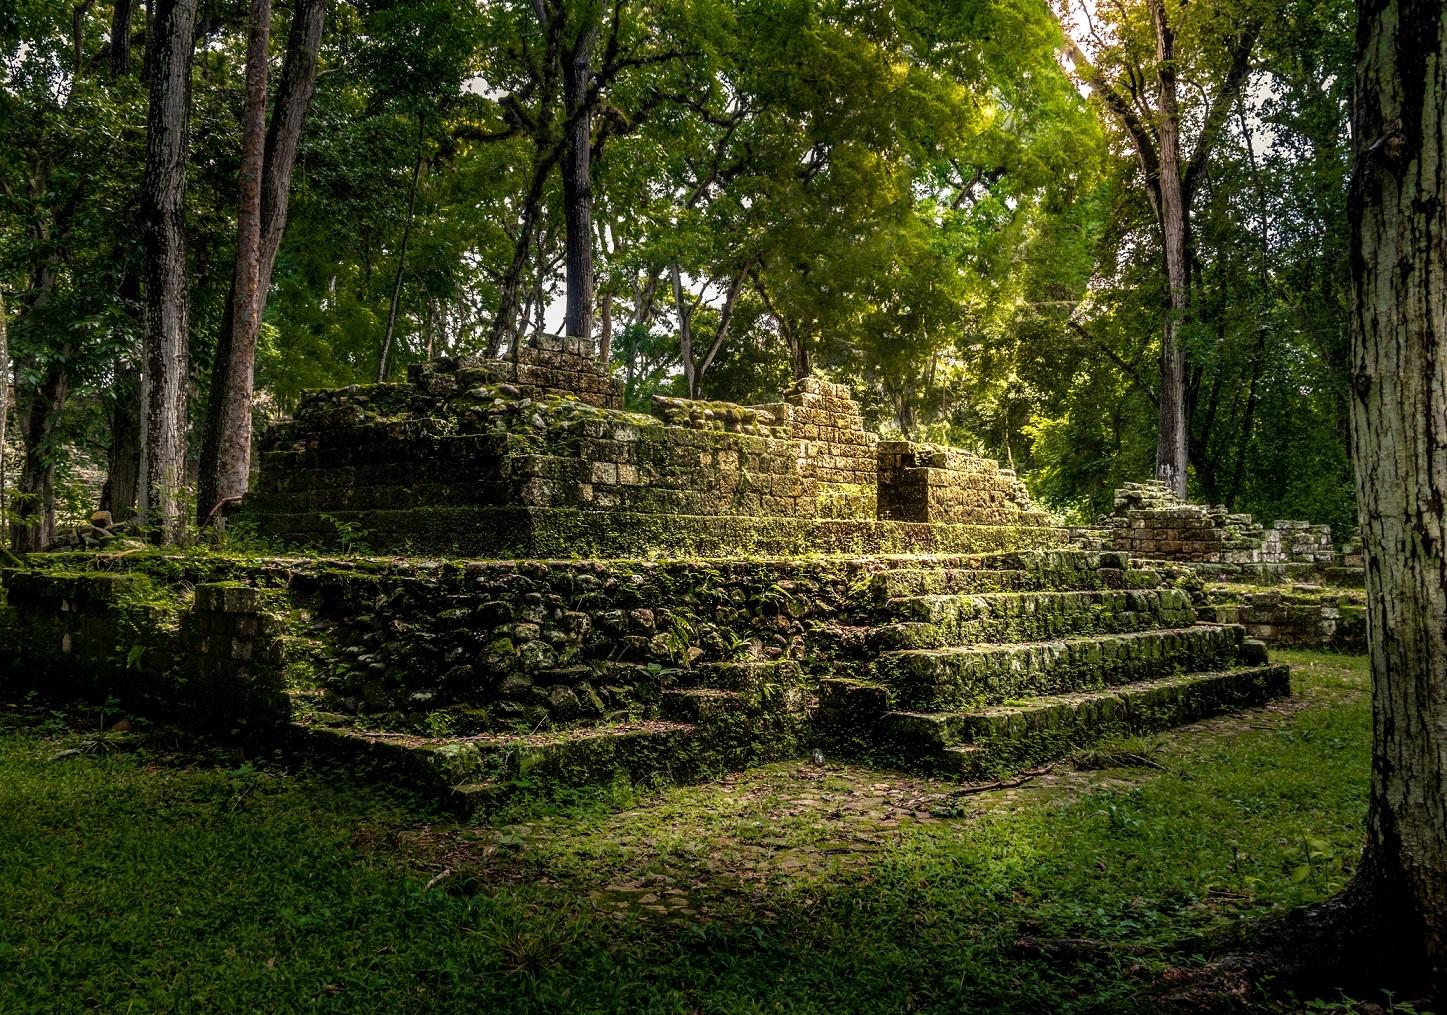 Mayan ruins in Honduras